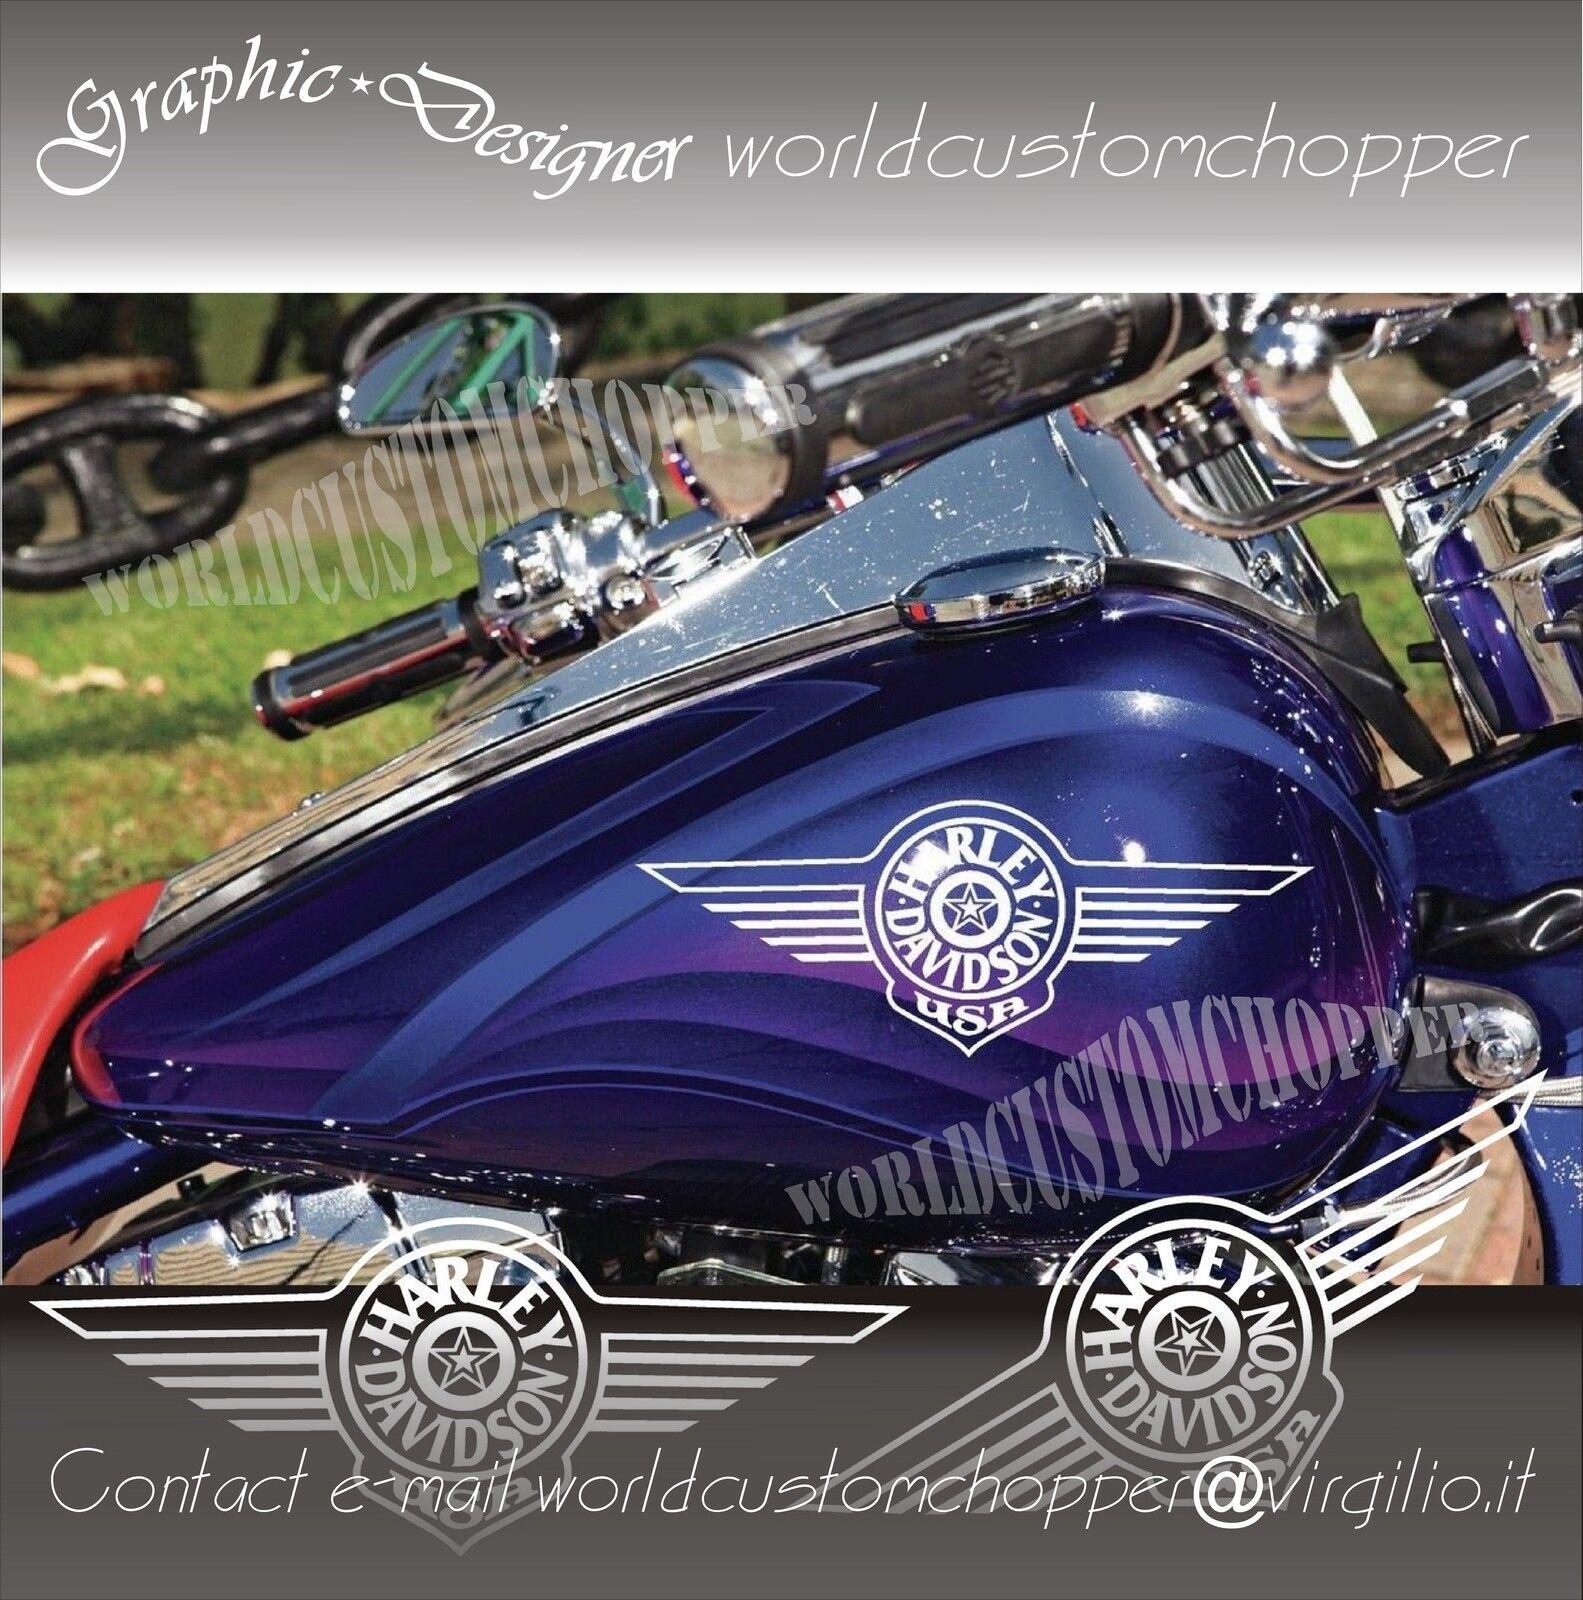 Decal Replica originali 1995 Softail Springer Adesivi serbatoio Harley-Davidson